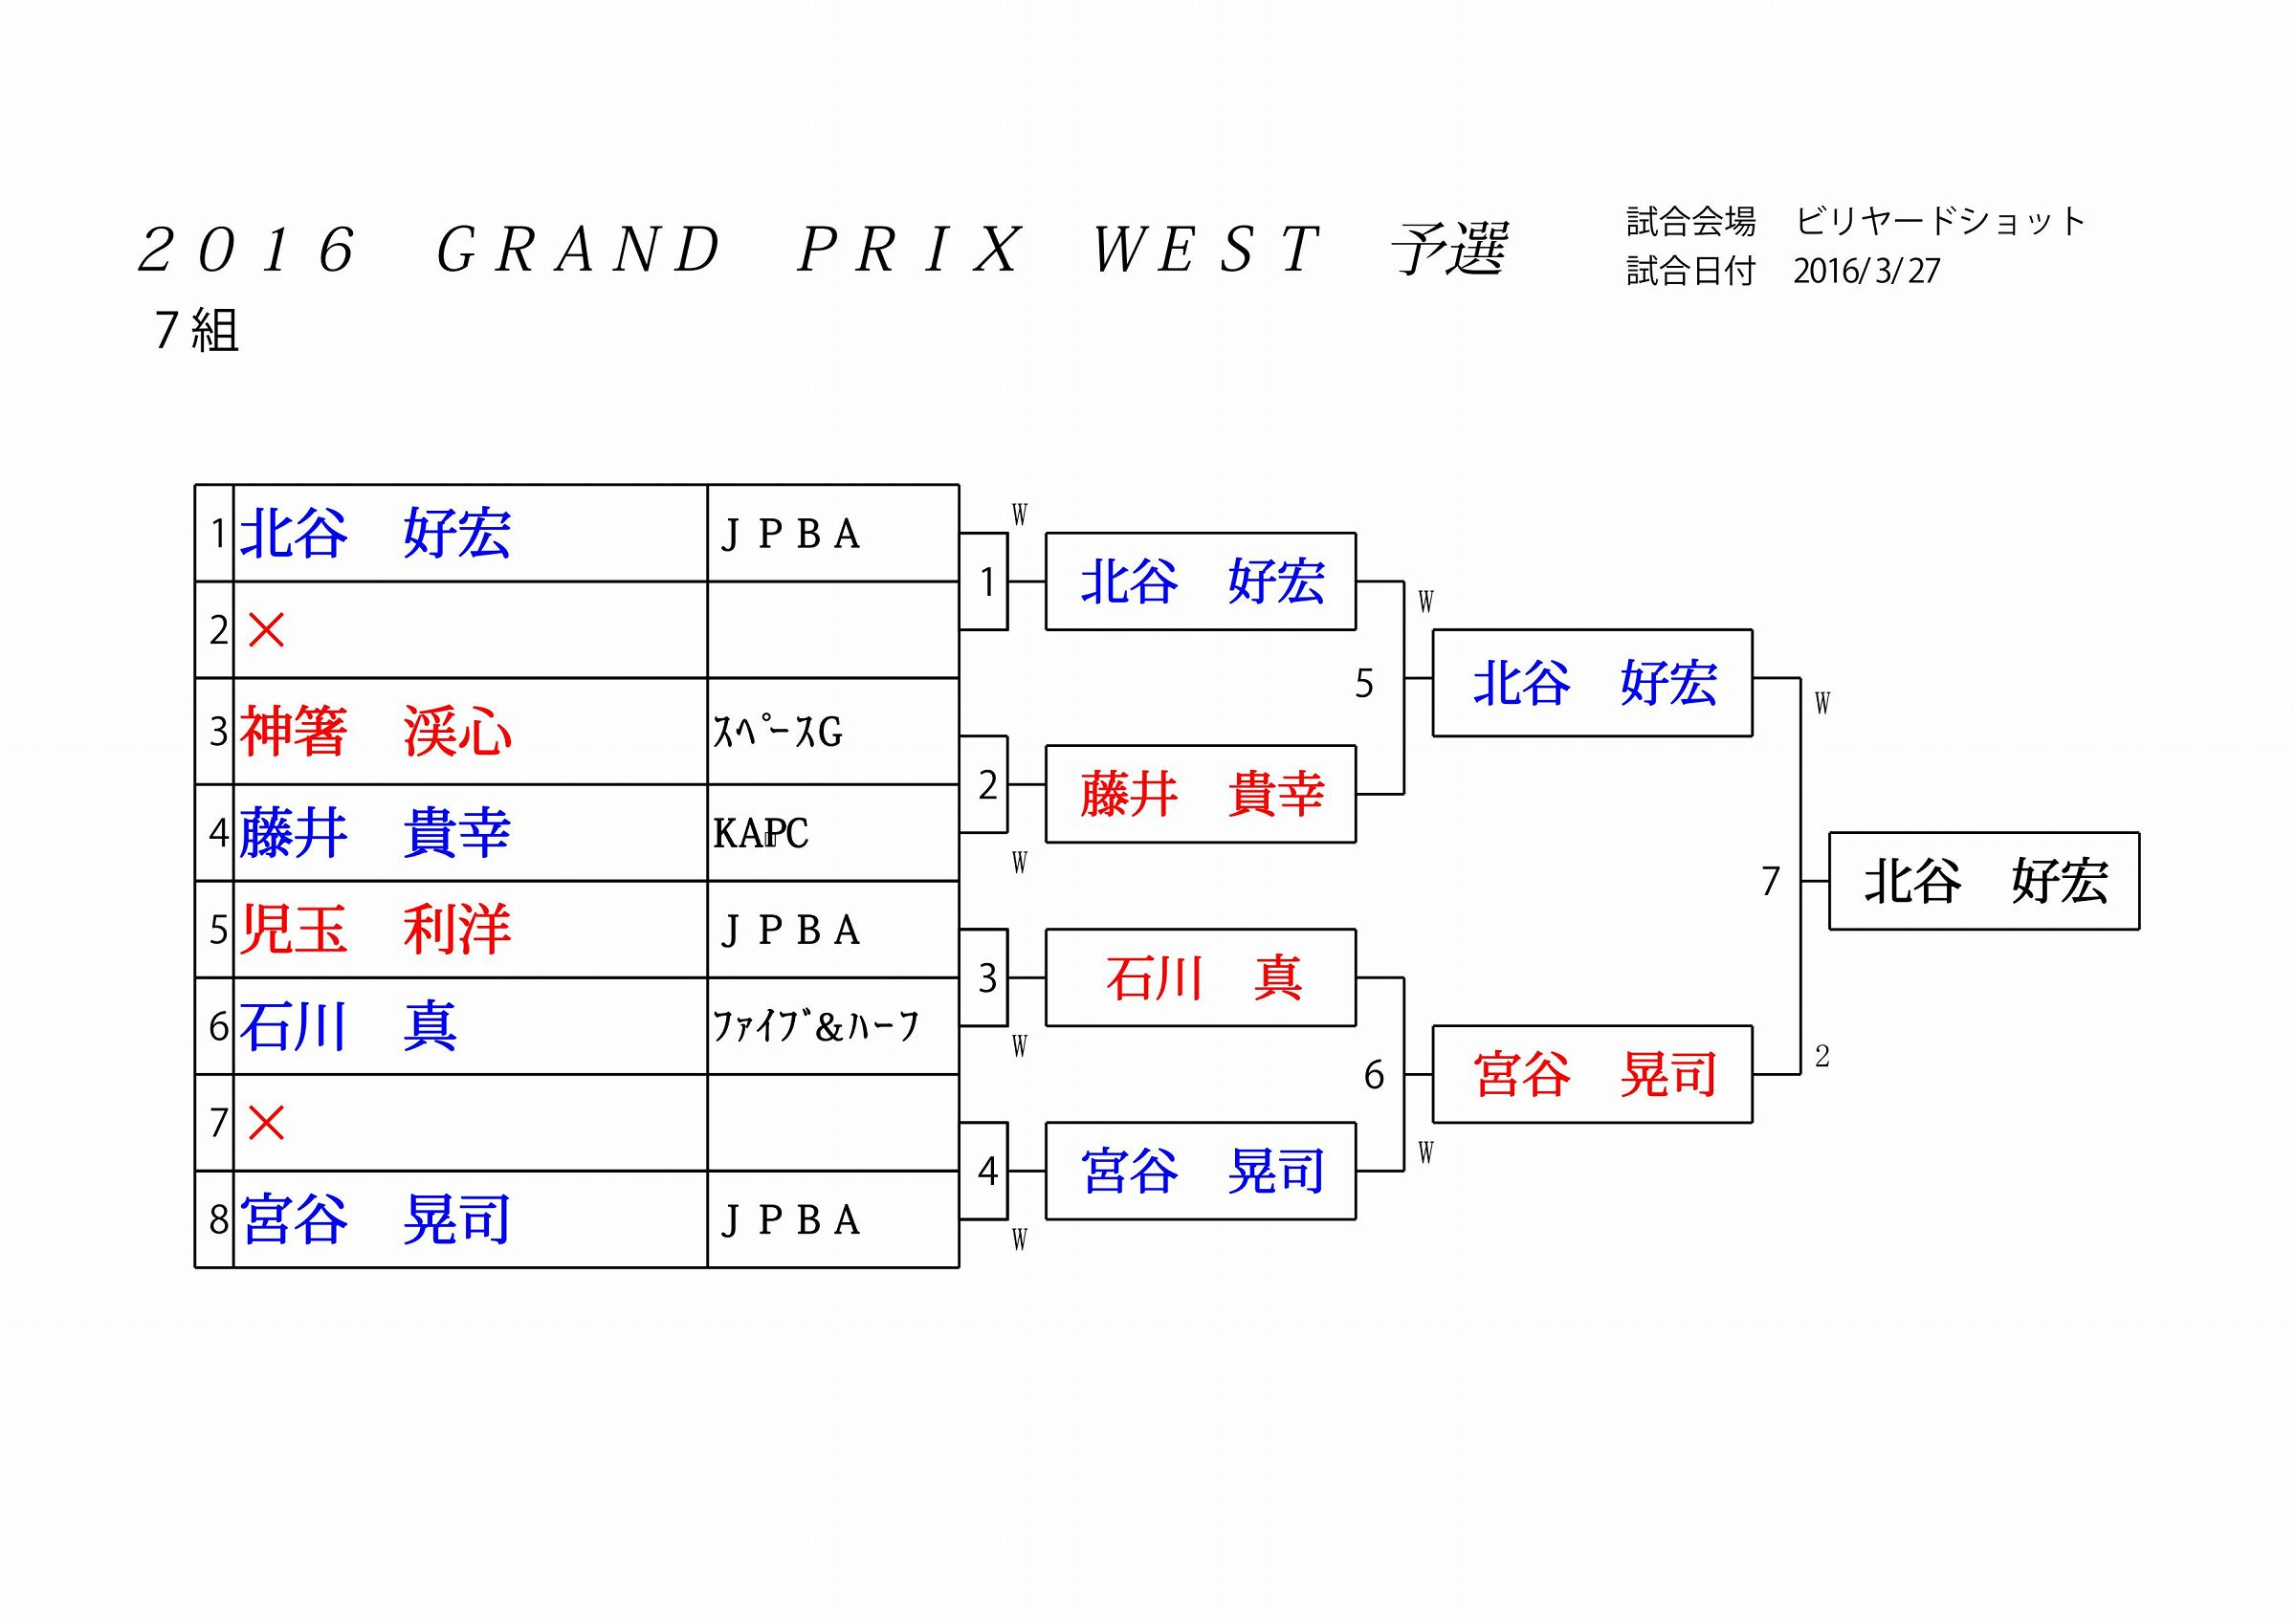 2016 GRAND PRIX WEST 予選_07